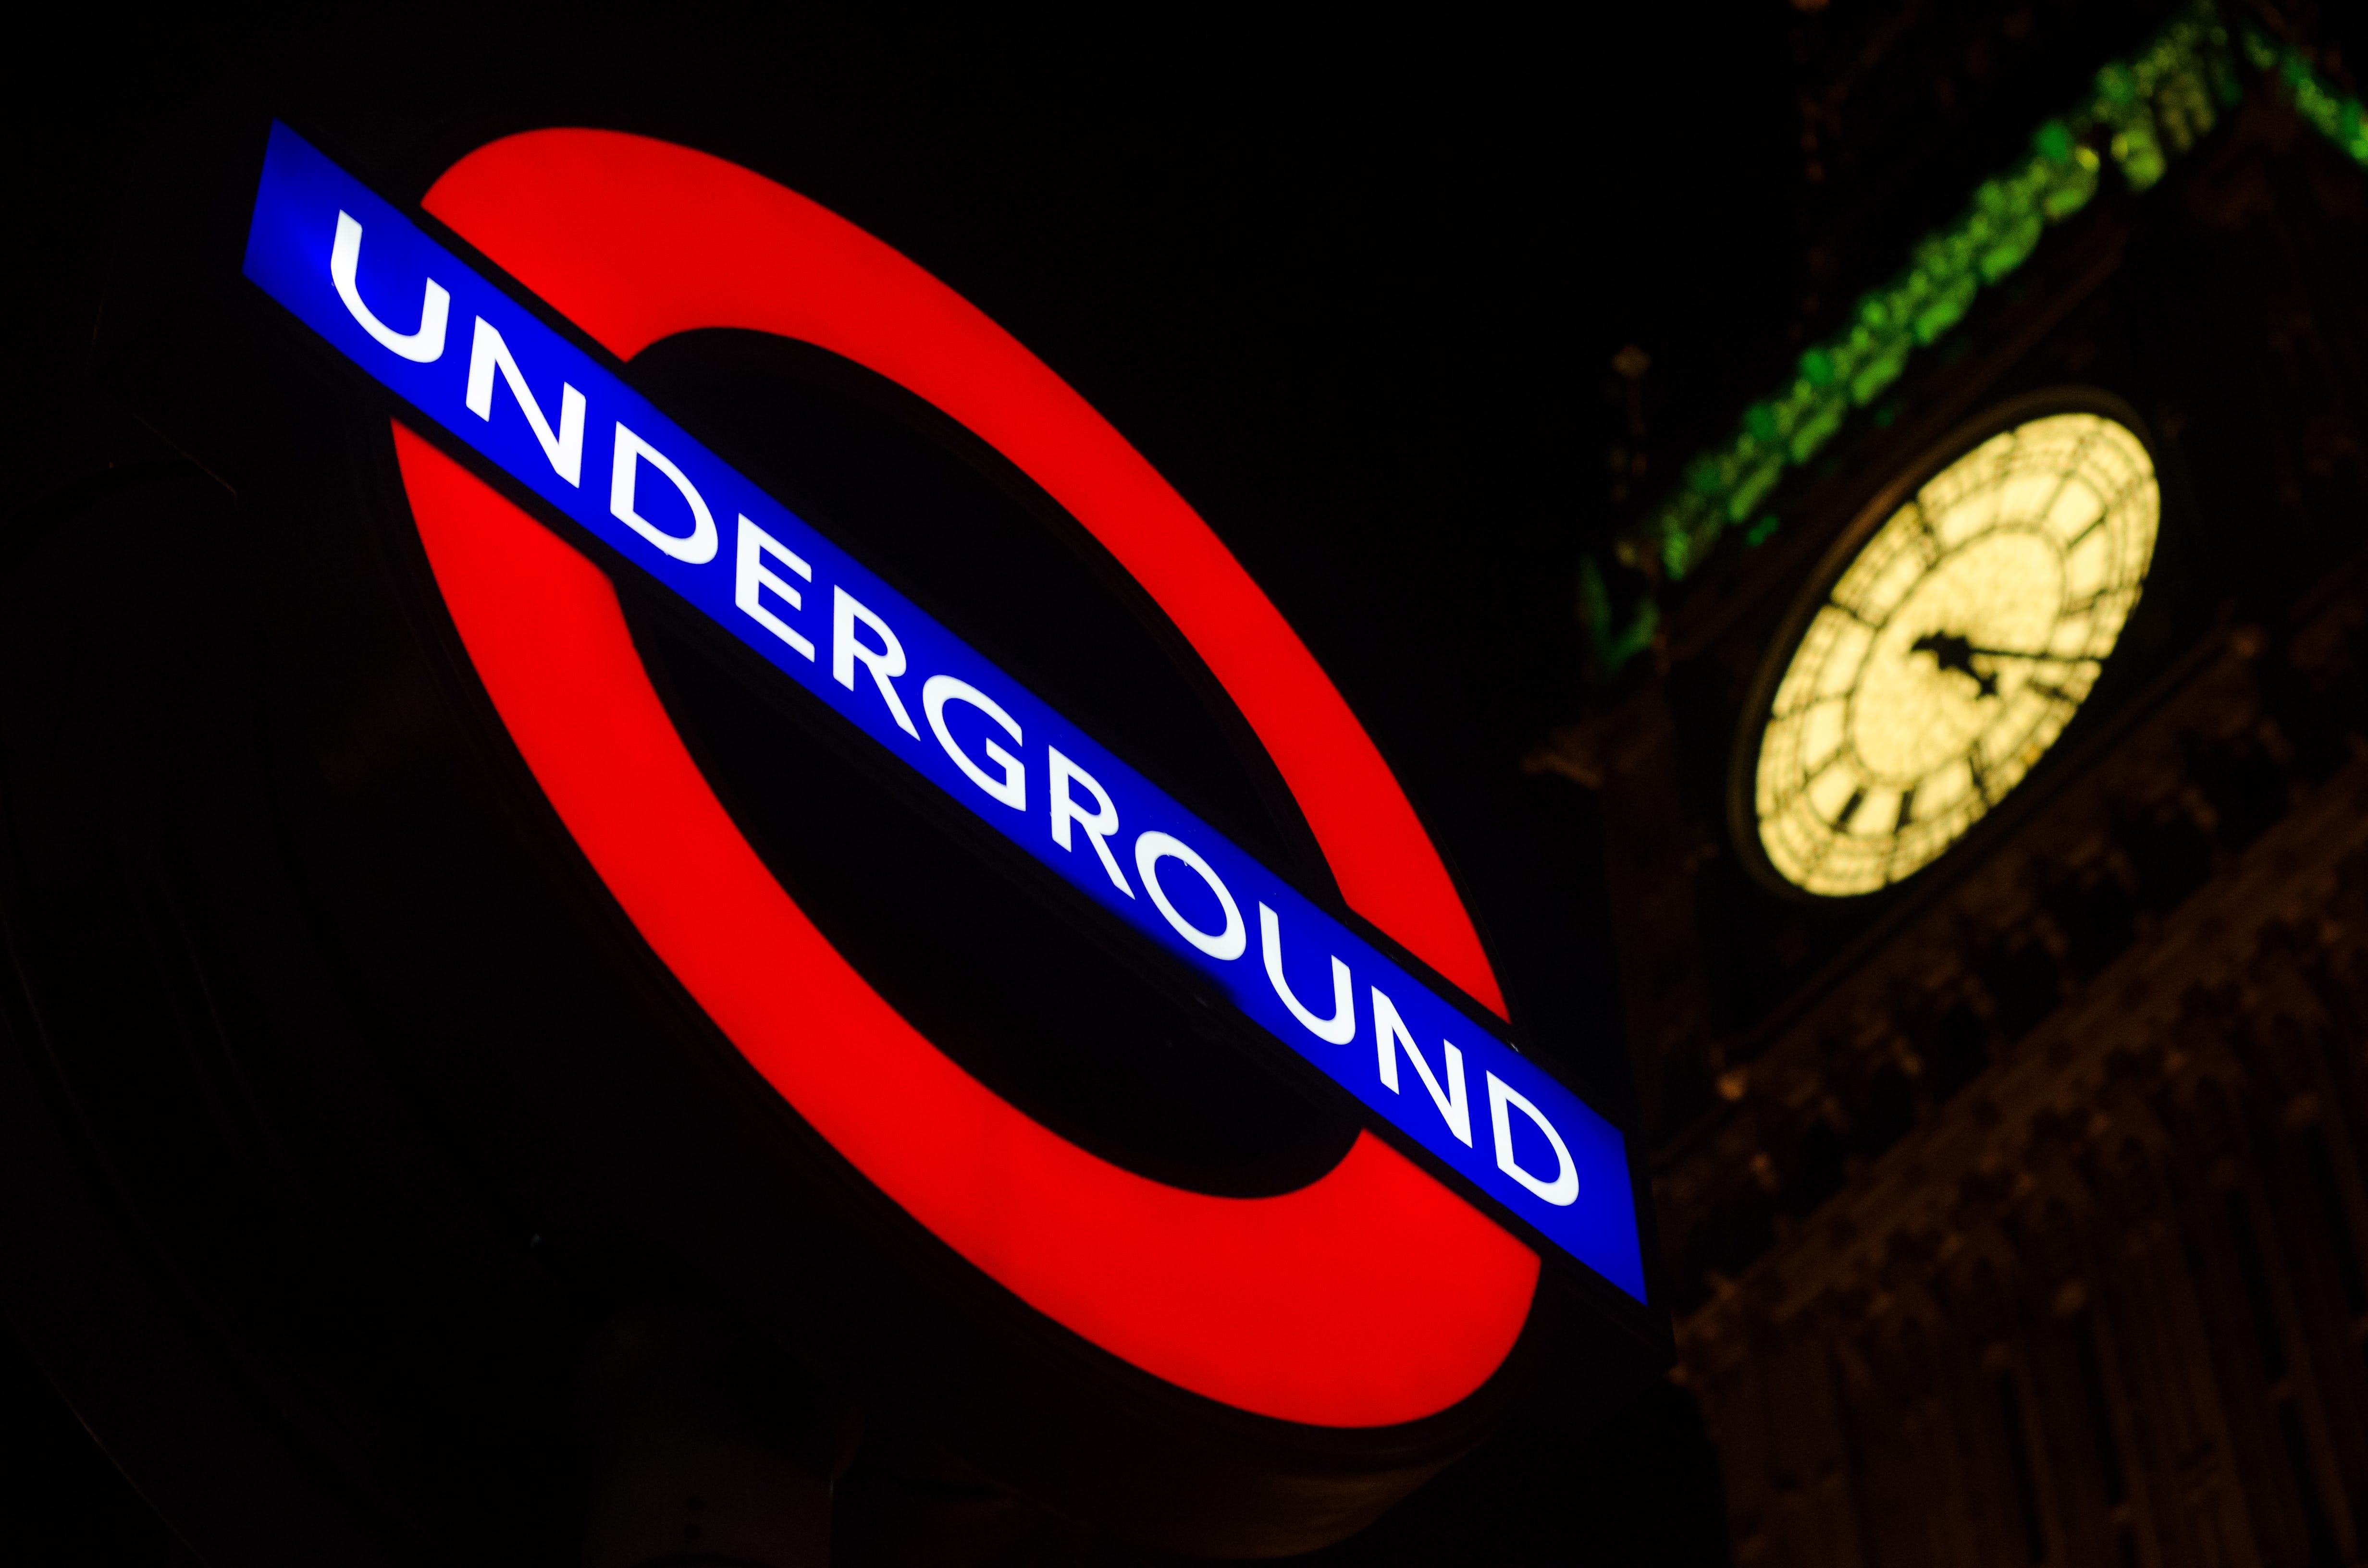 Underground Signage Near Clock Tower during Night